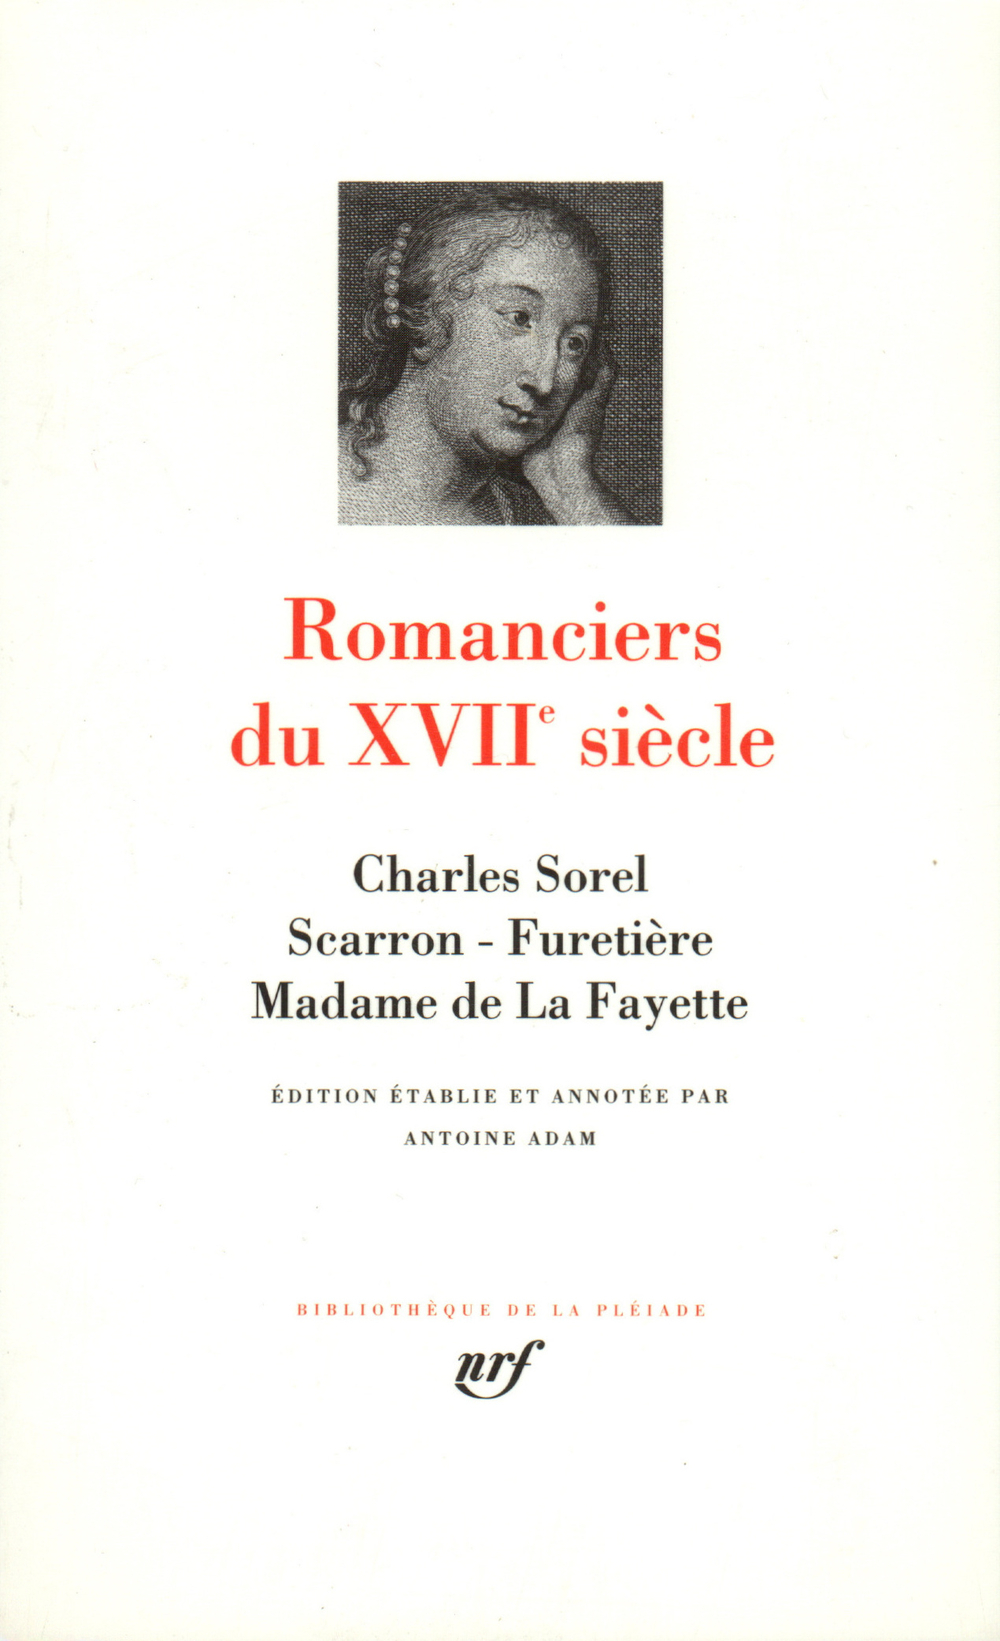 ROMANCIERS DU XVIIE SIECLE